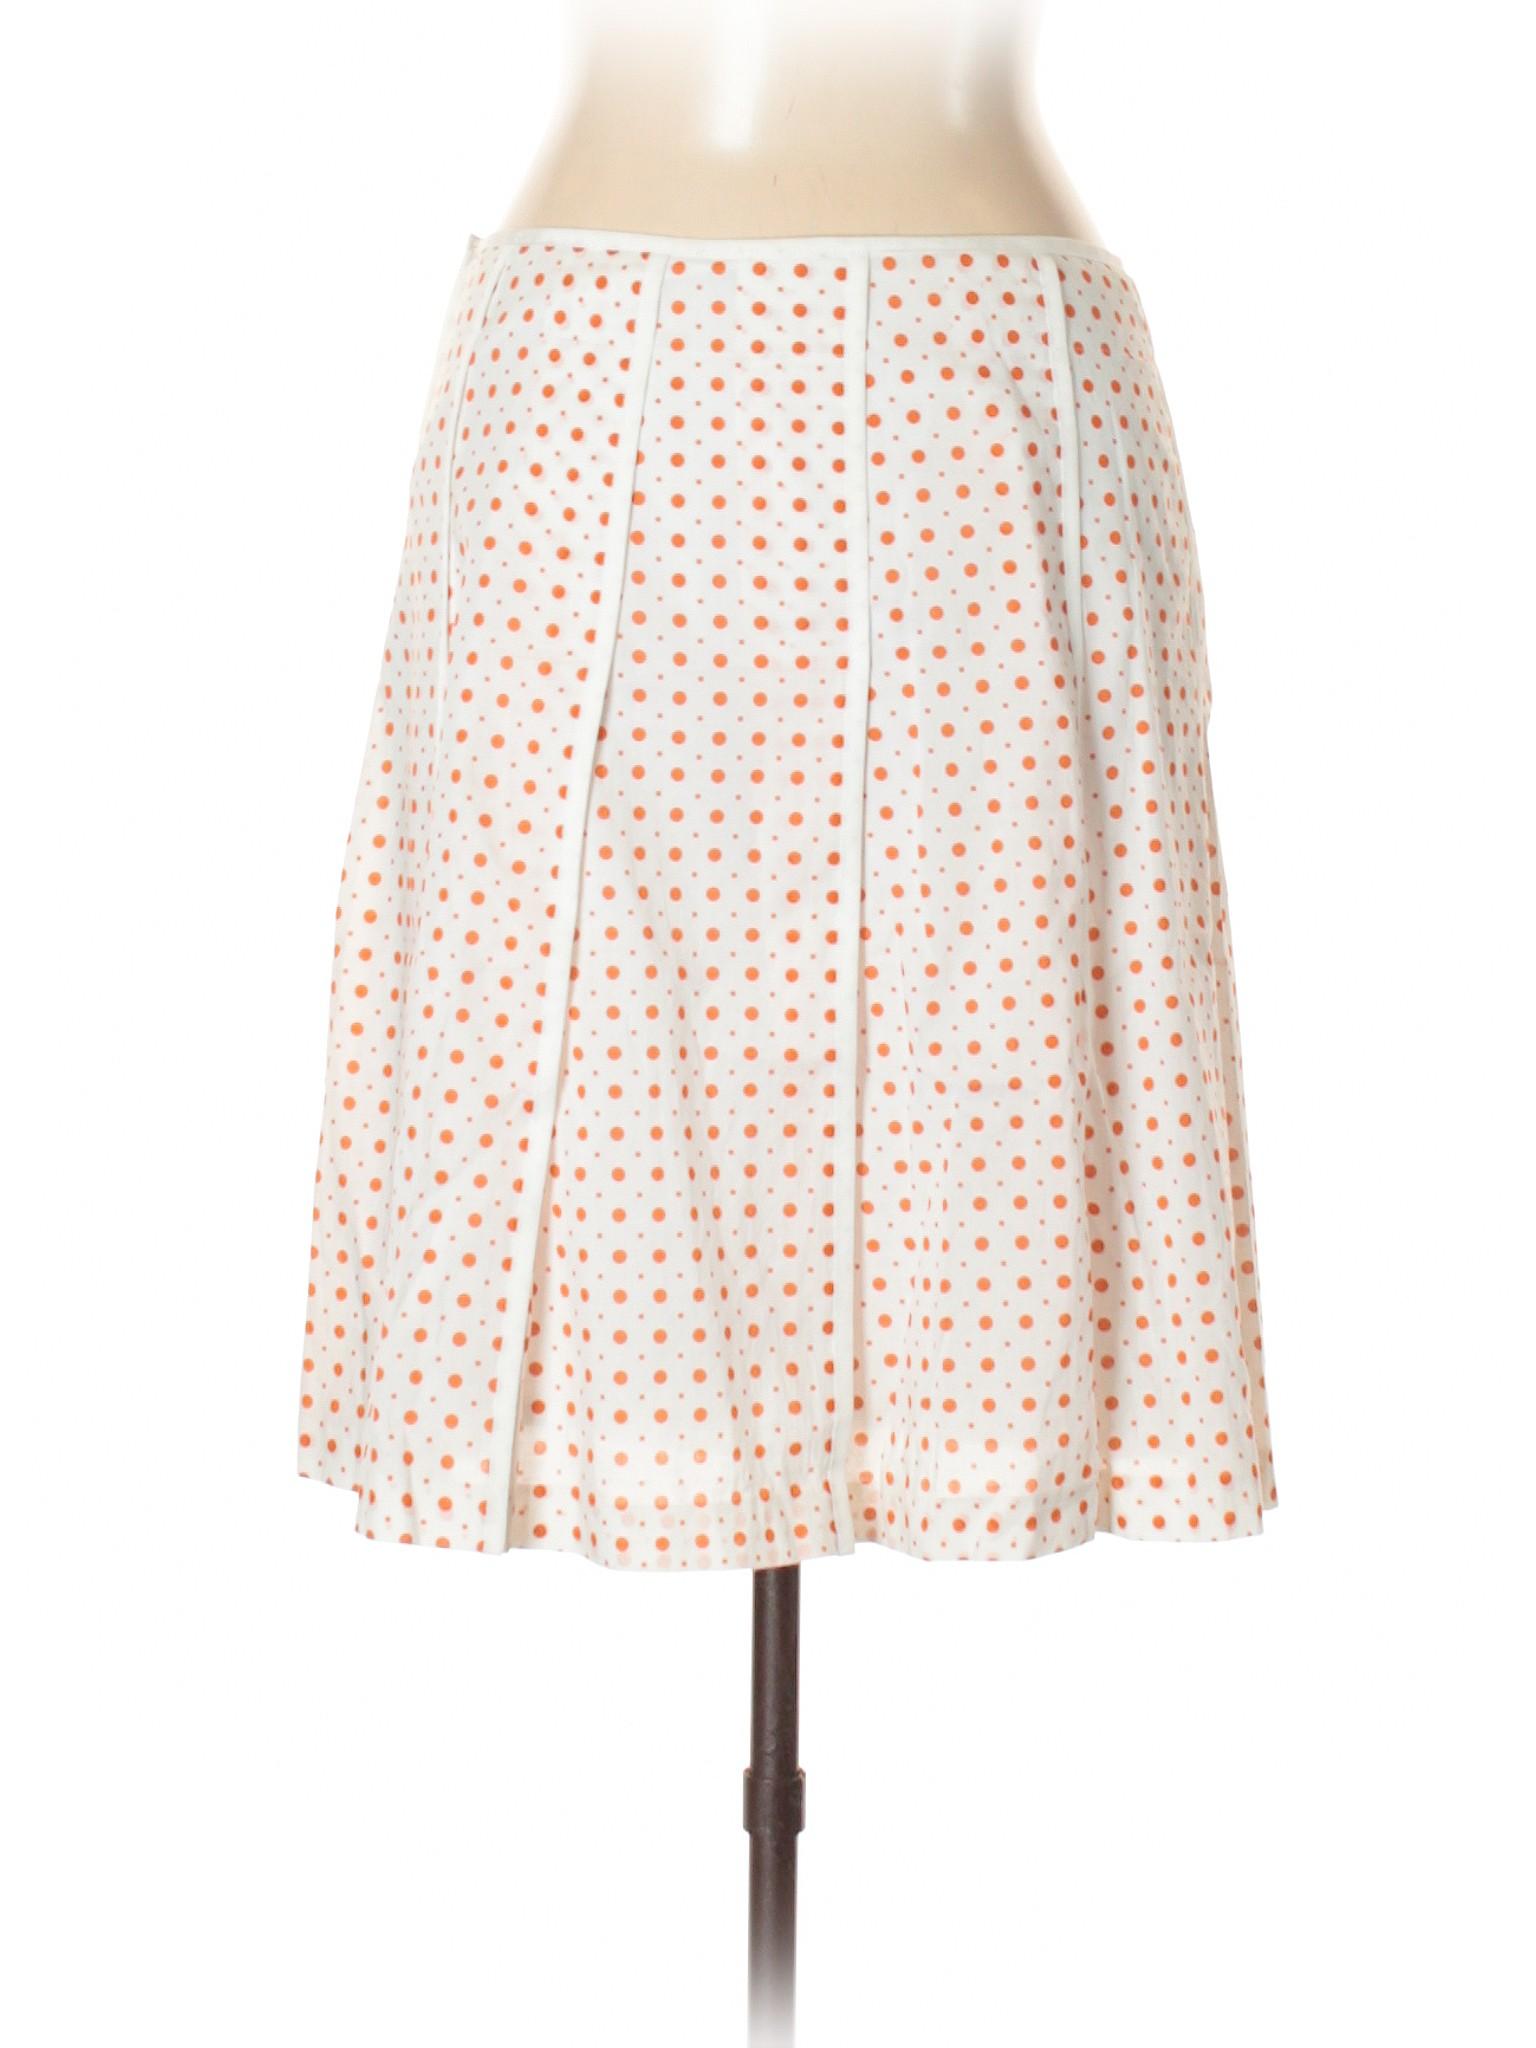 Tahari Elie Skirt Boutique Boutique Elie Tahari Casual Skirt Casual wnOqRYW4x